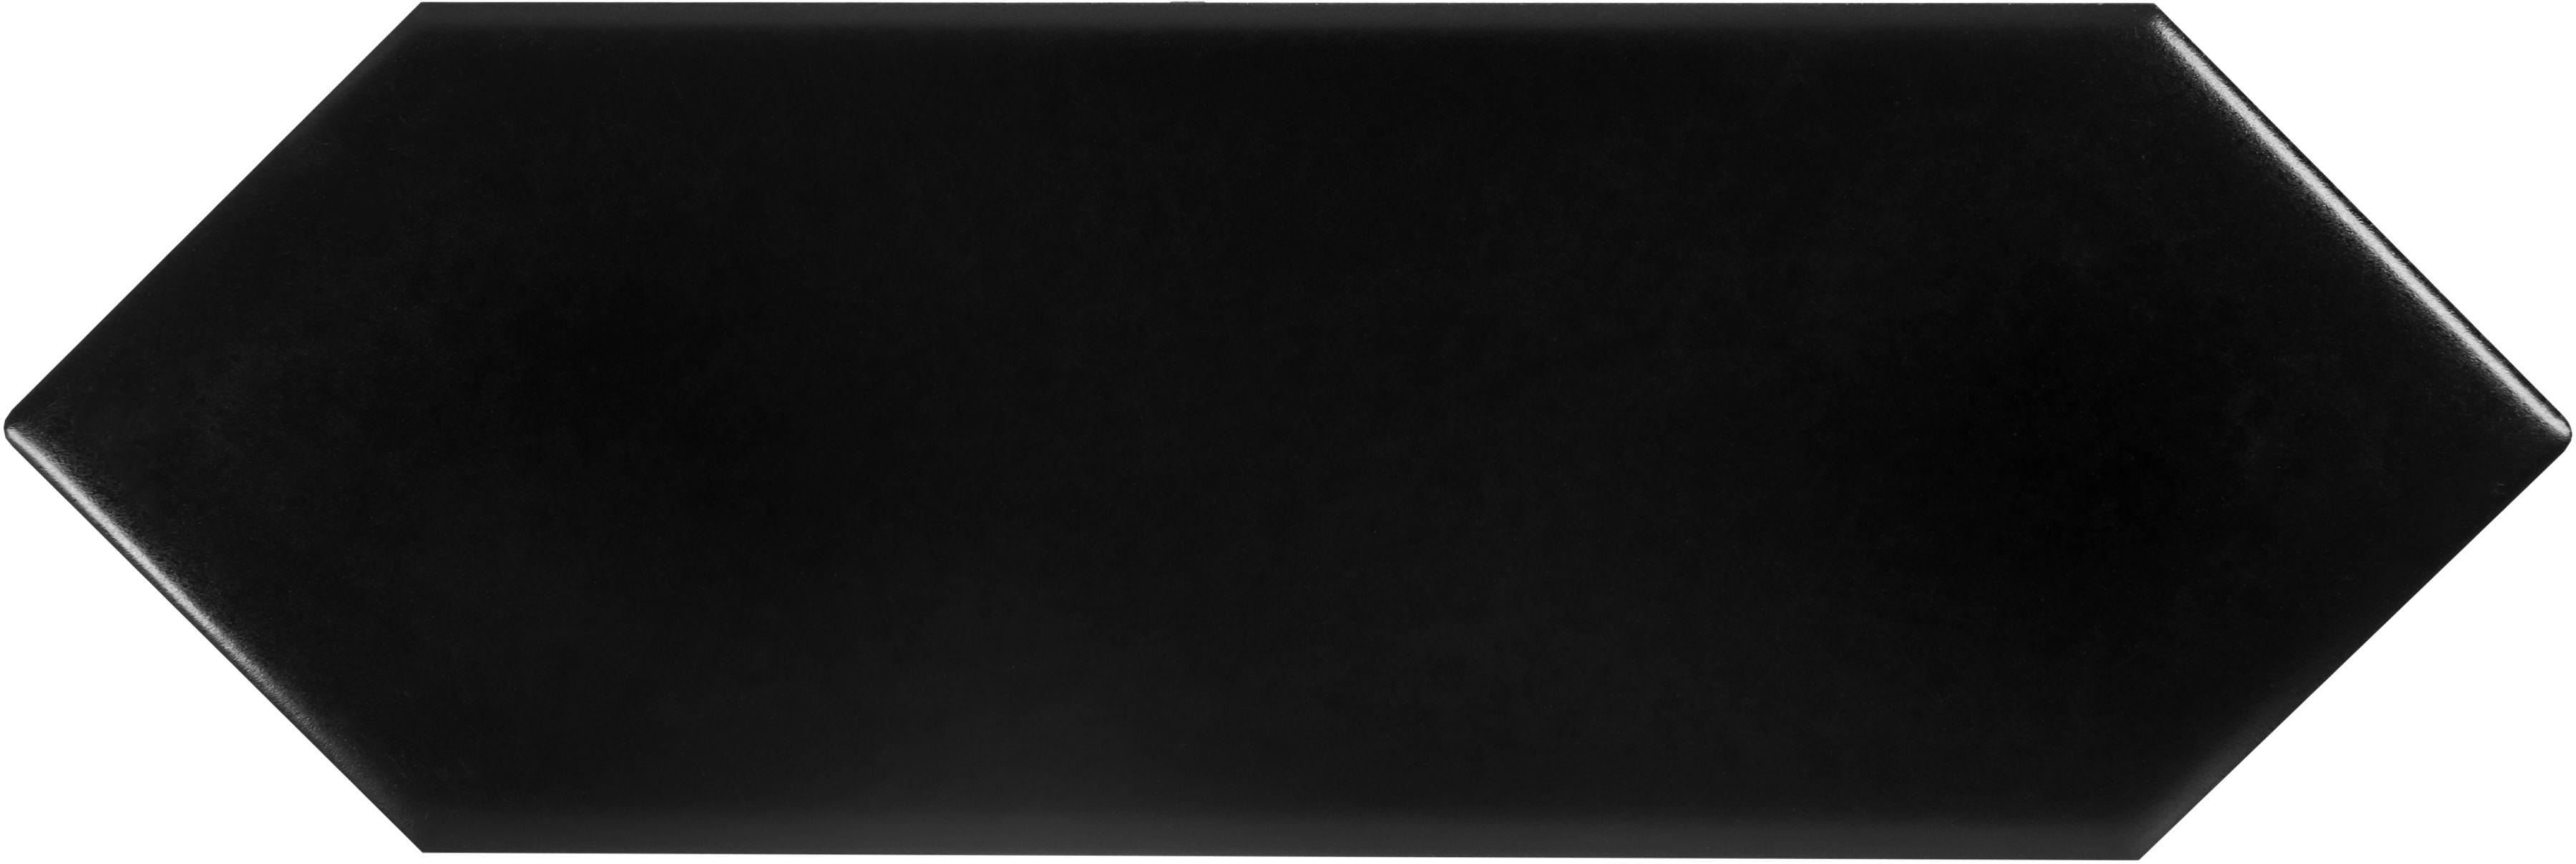 Dunin Tritone Black Matt 01 7,5x22,7 płytka ścienna